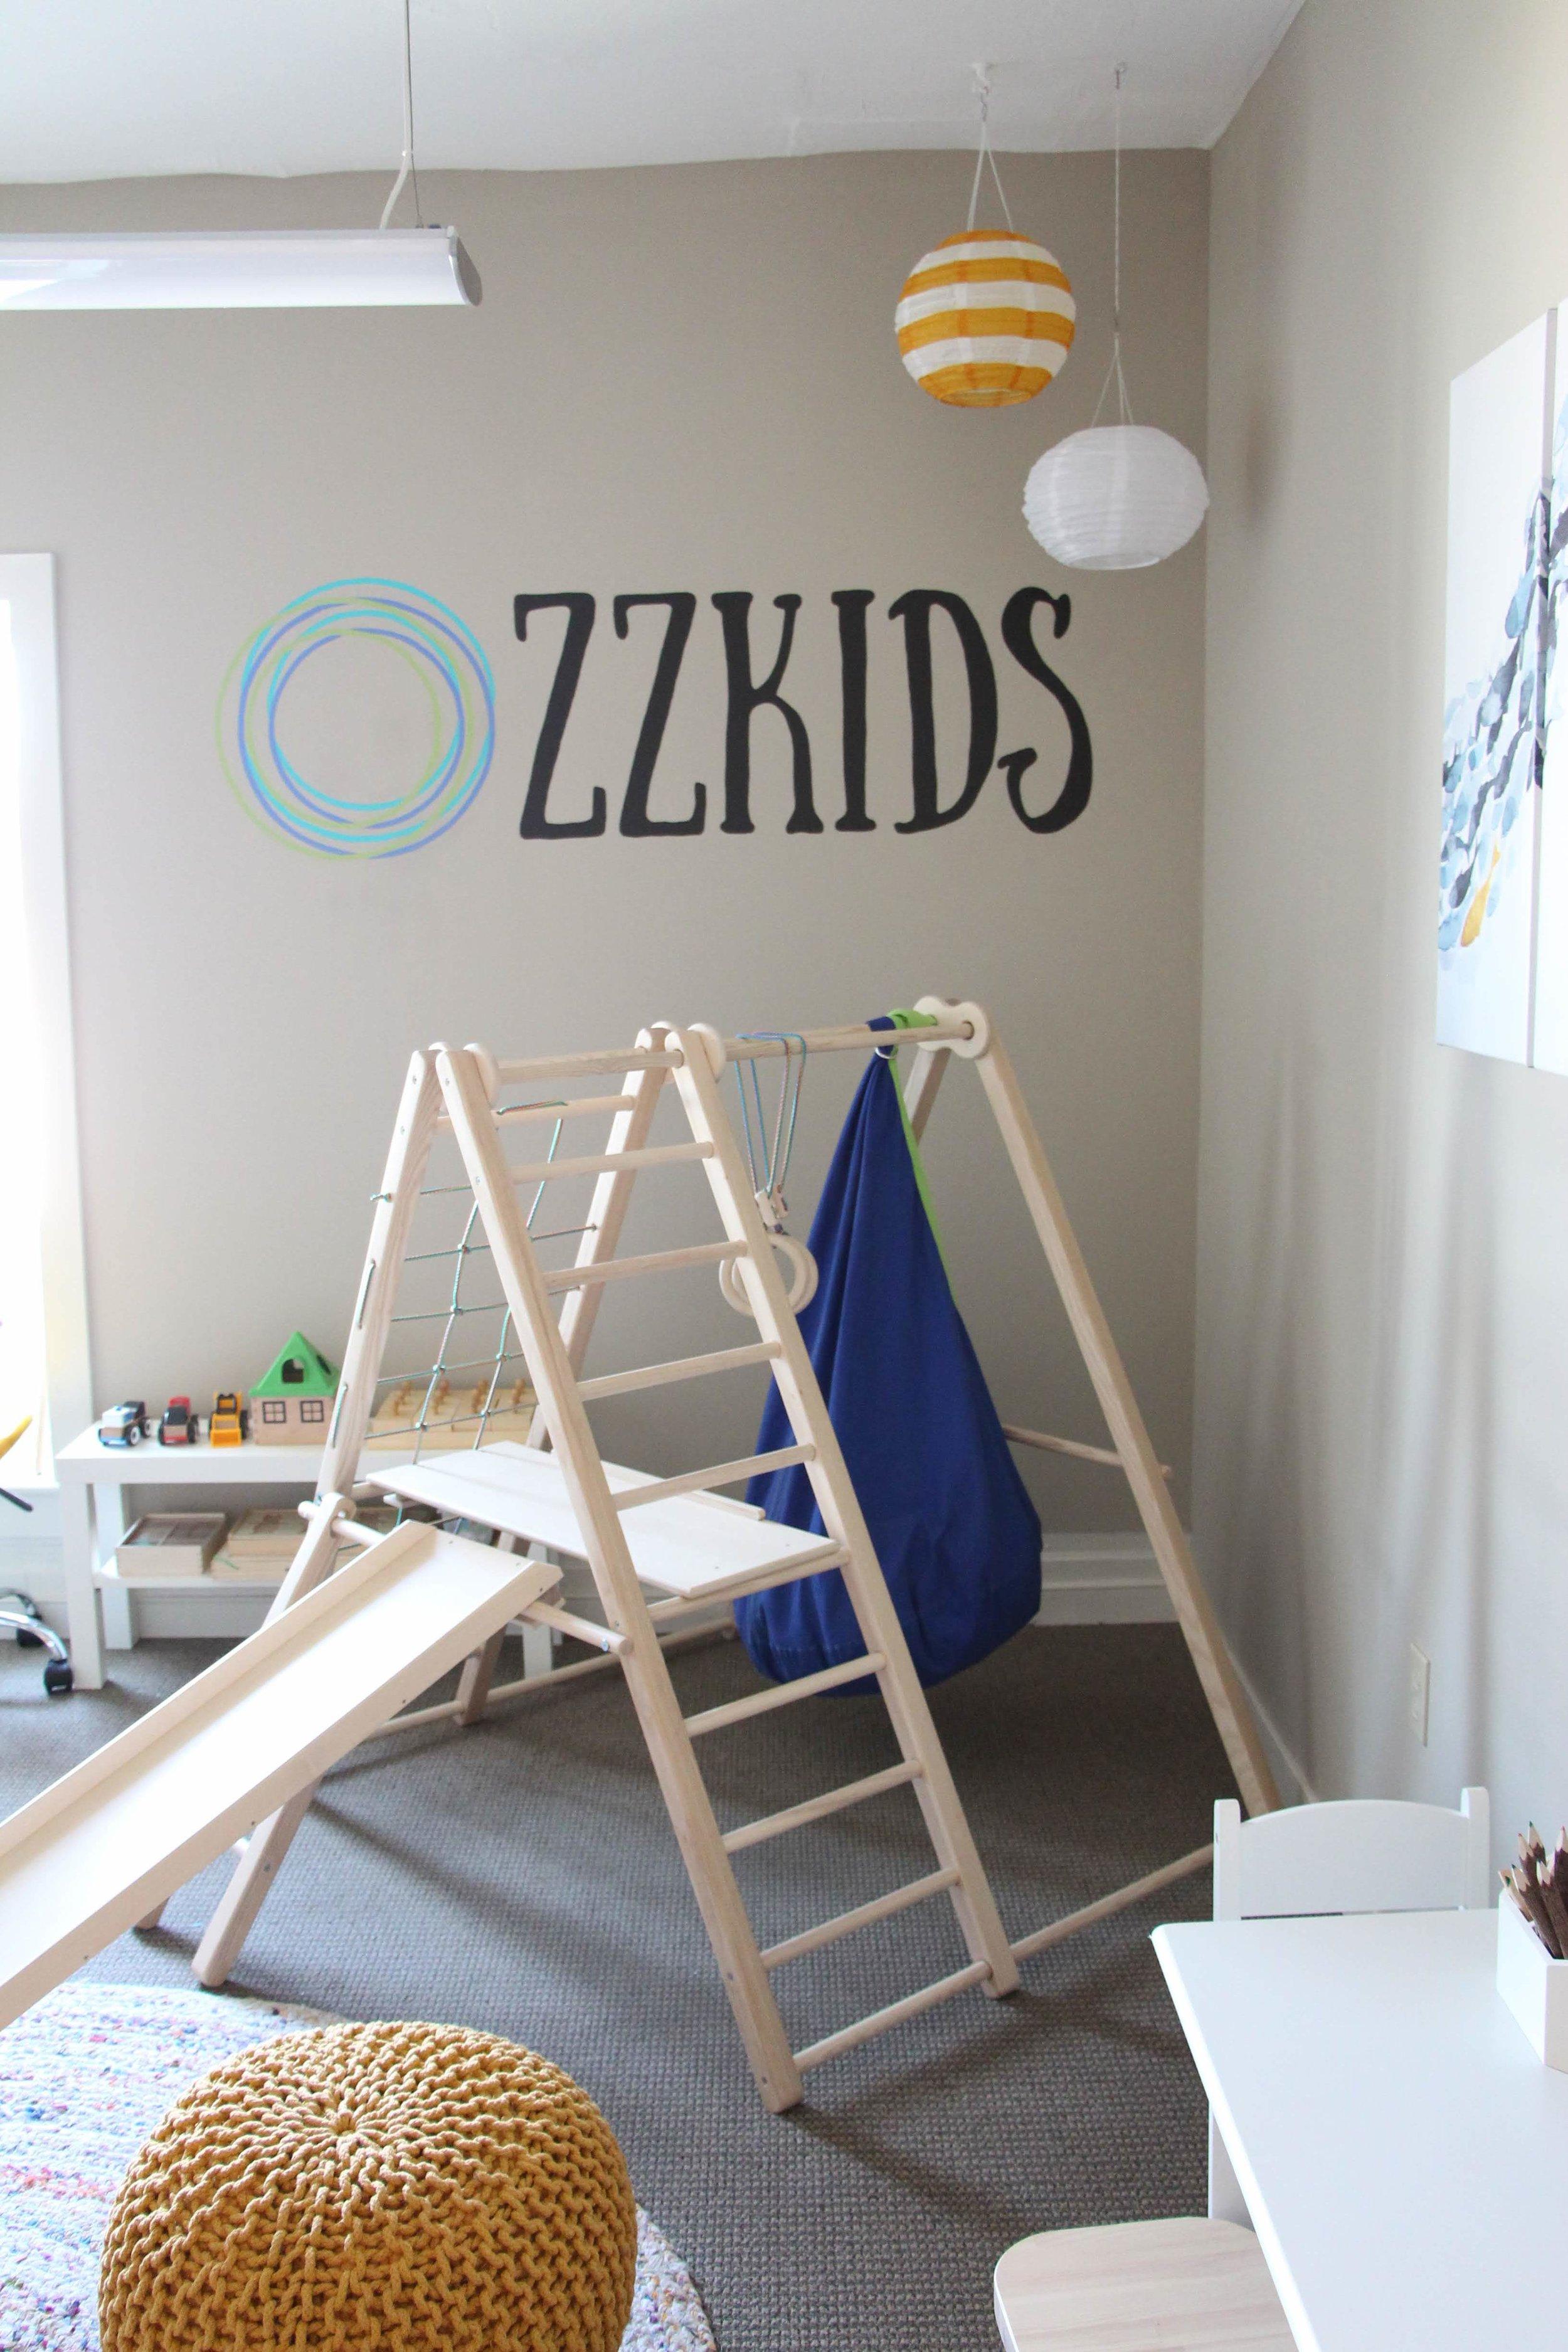 ZZKids playstructure.JPG